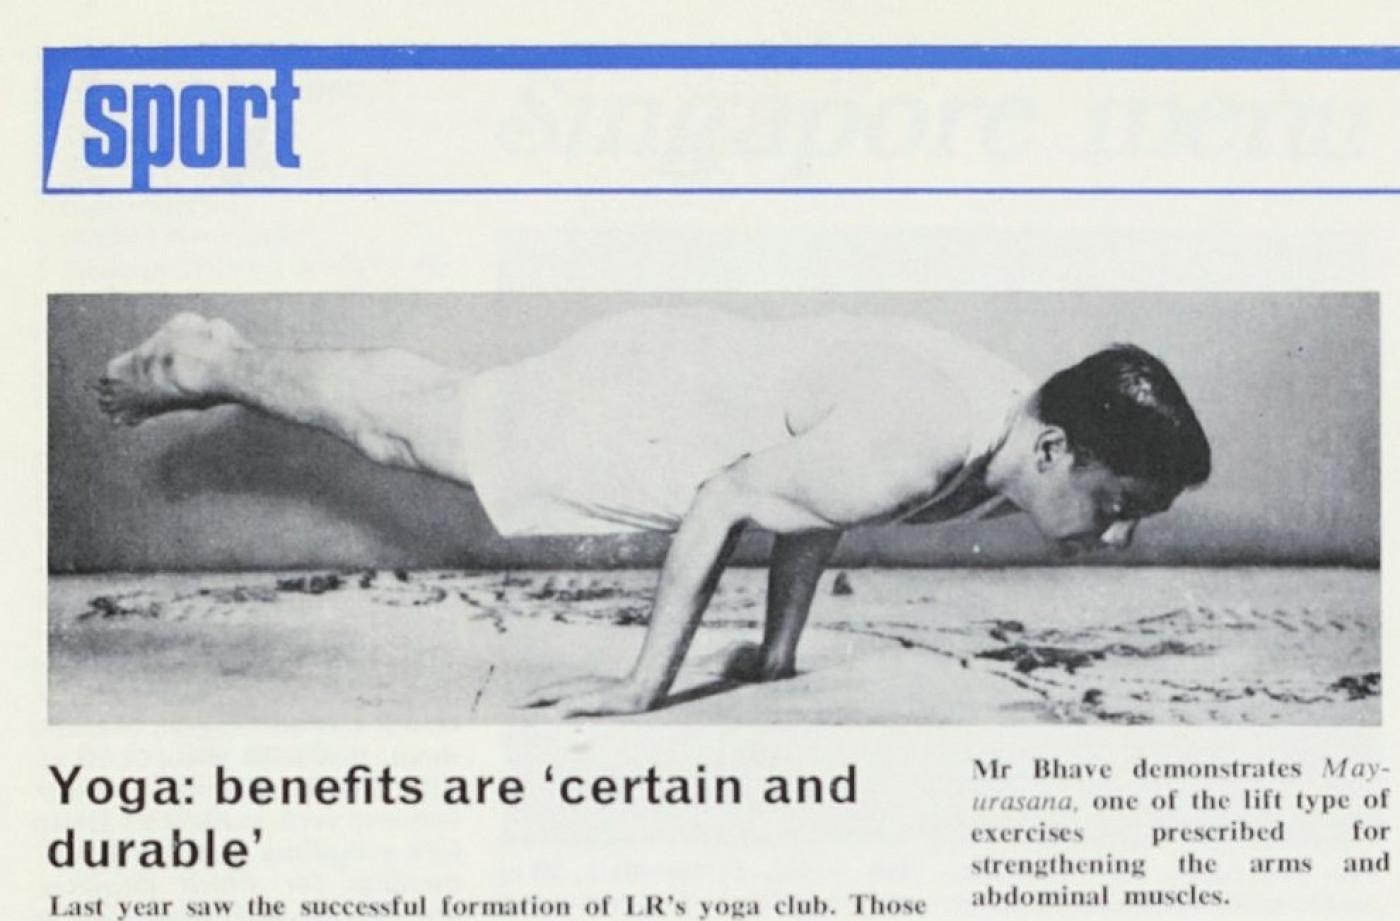 Article on LR's Yoga Club, Society Magazine 1978